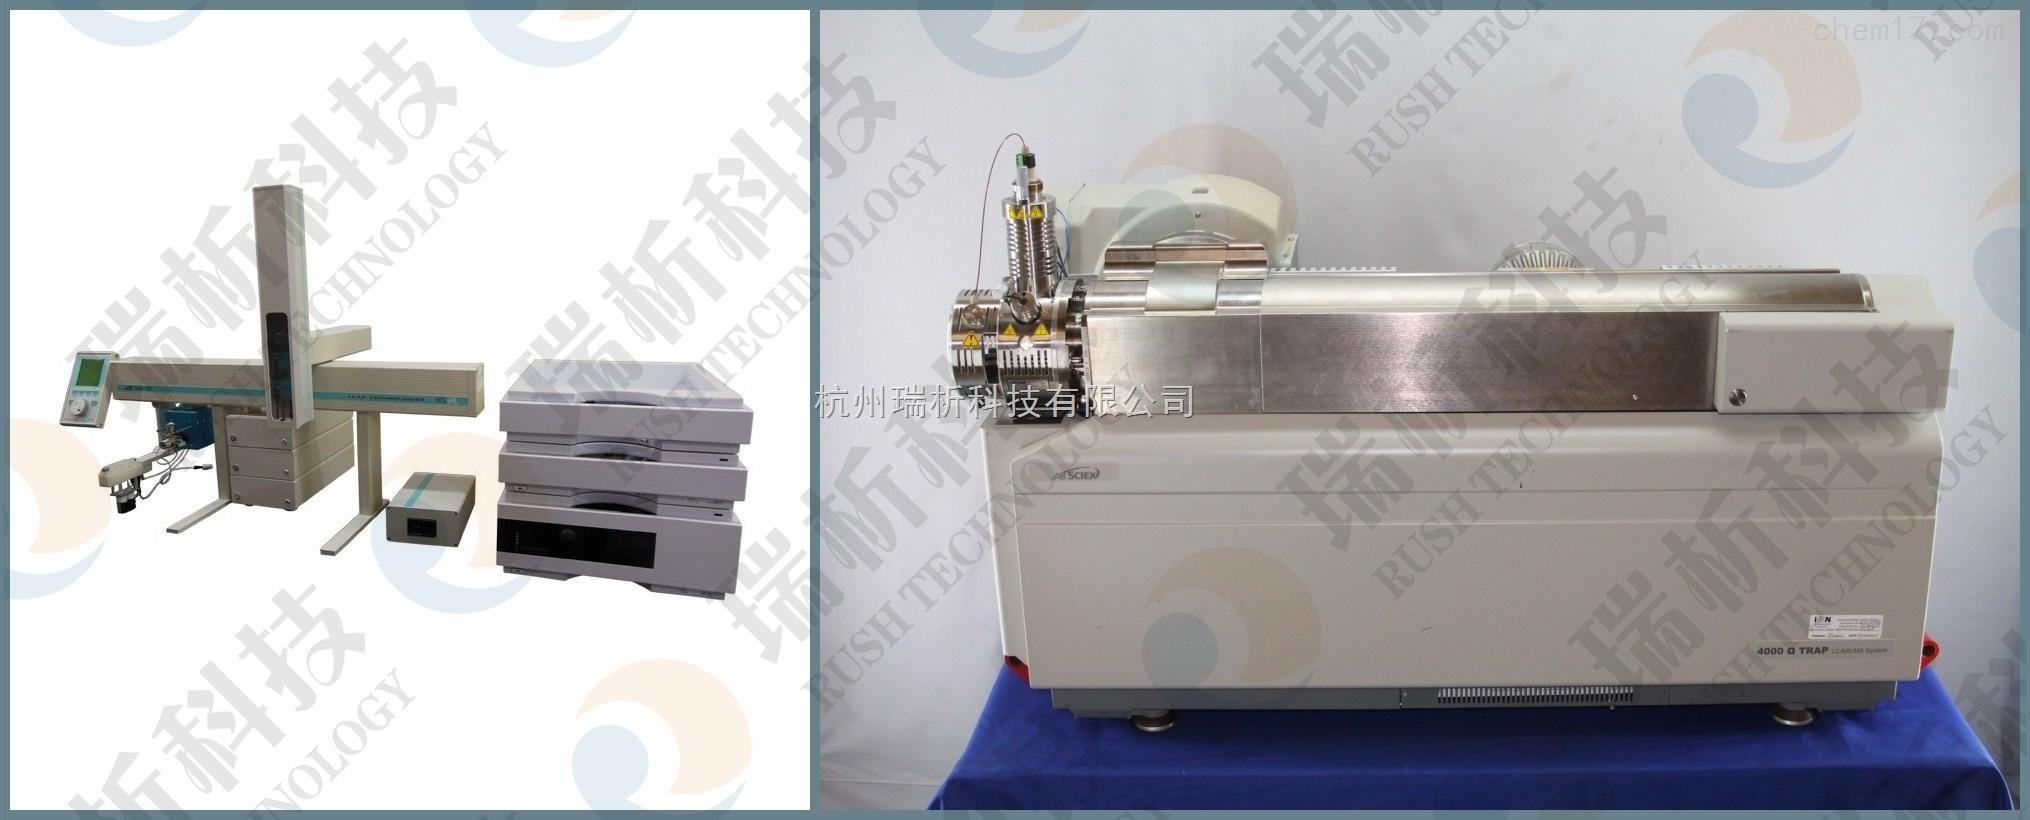 AB 1200-API4000安捷伦1200-API4000-三重四级杆液质联用仪